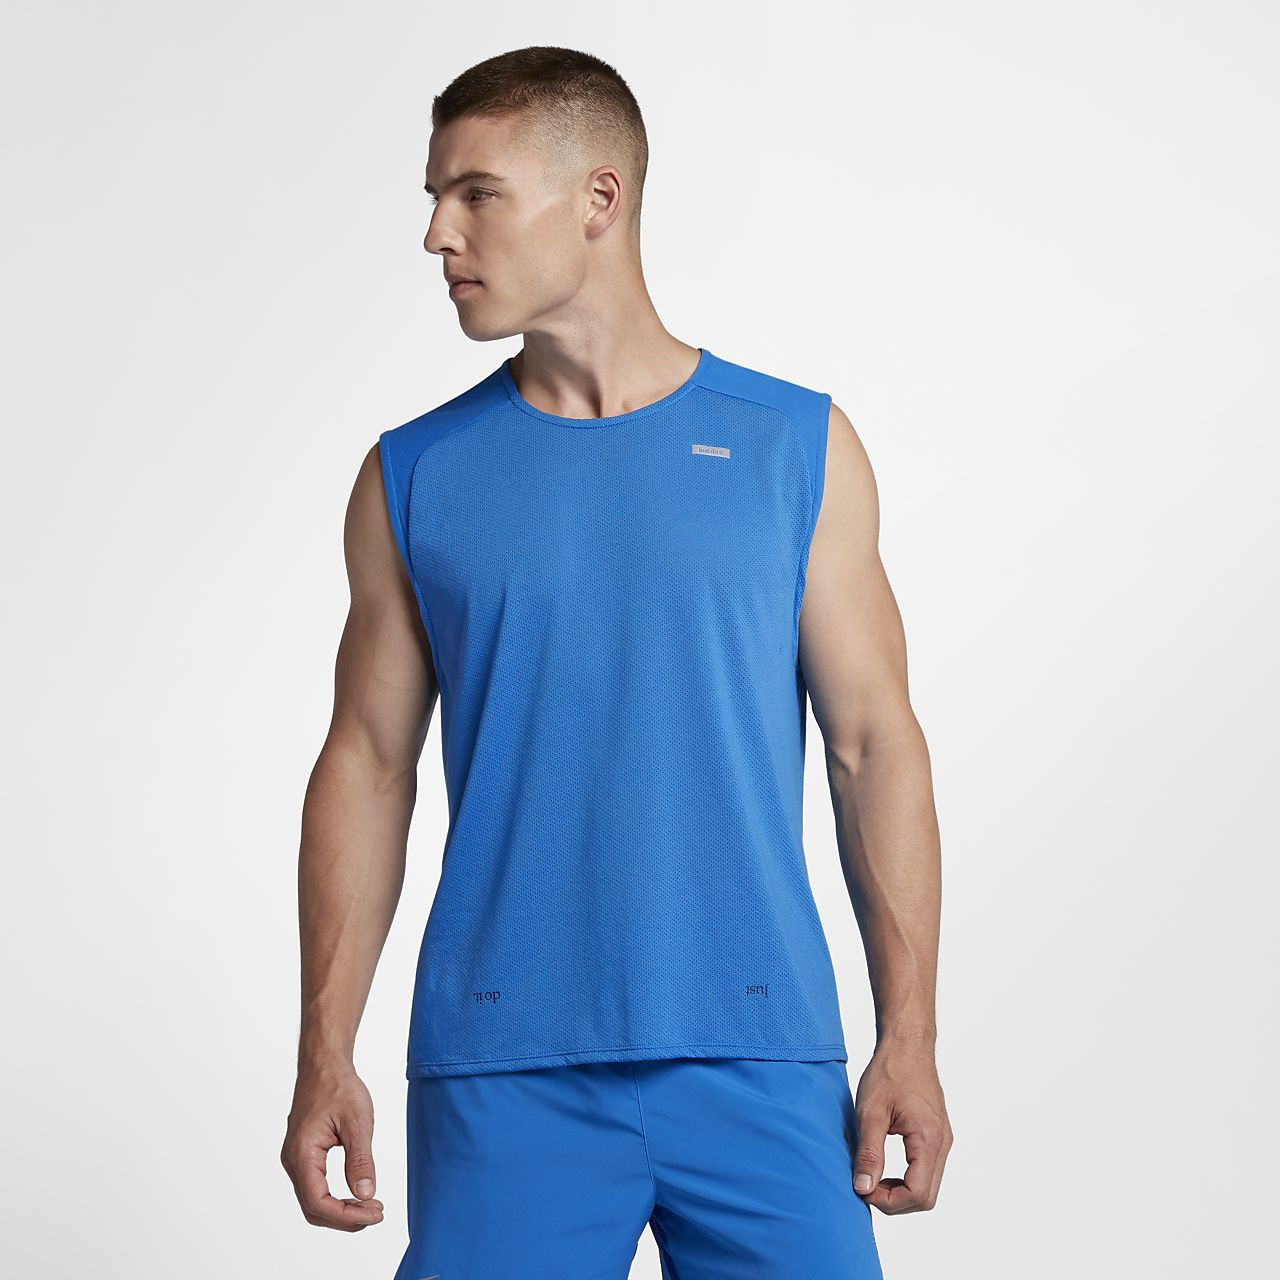 18a32b4b701778 Nike Rise 365 Men s Sleeveless Running Top. Nike.com AU